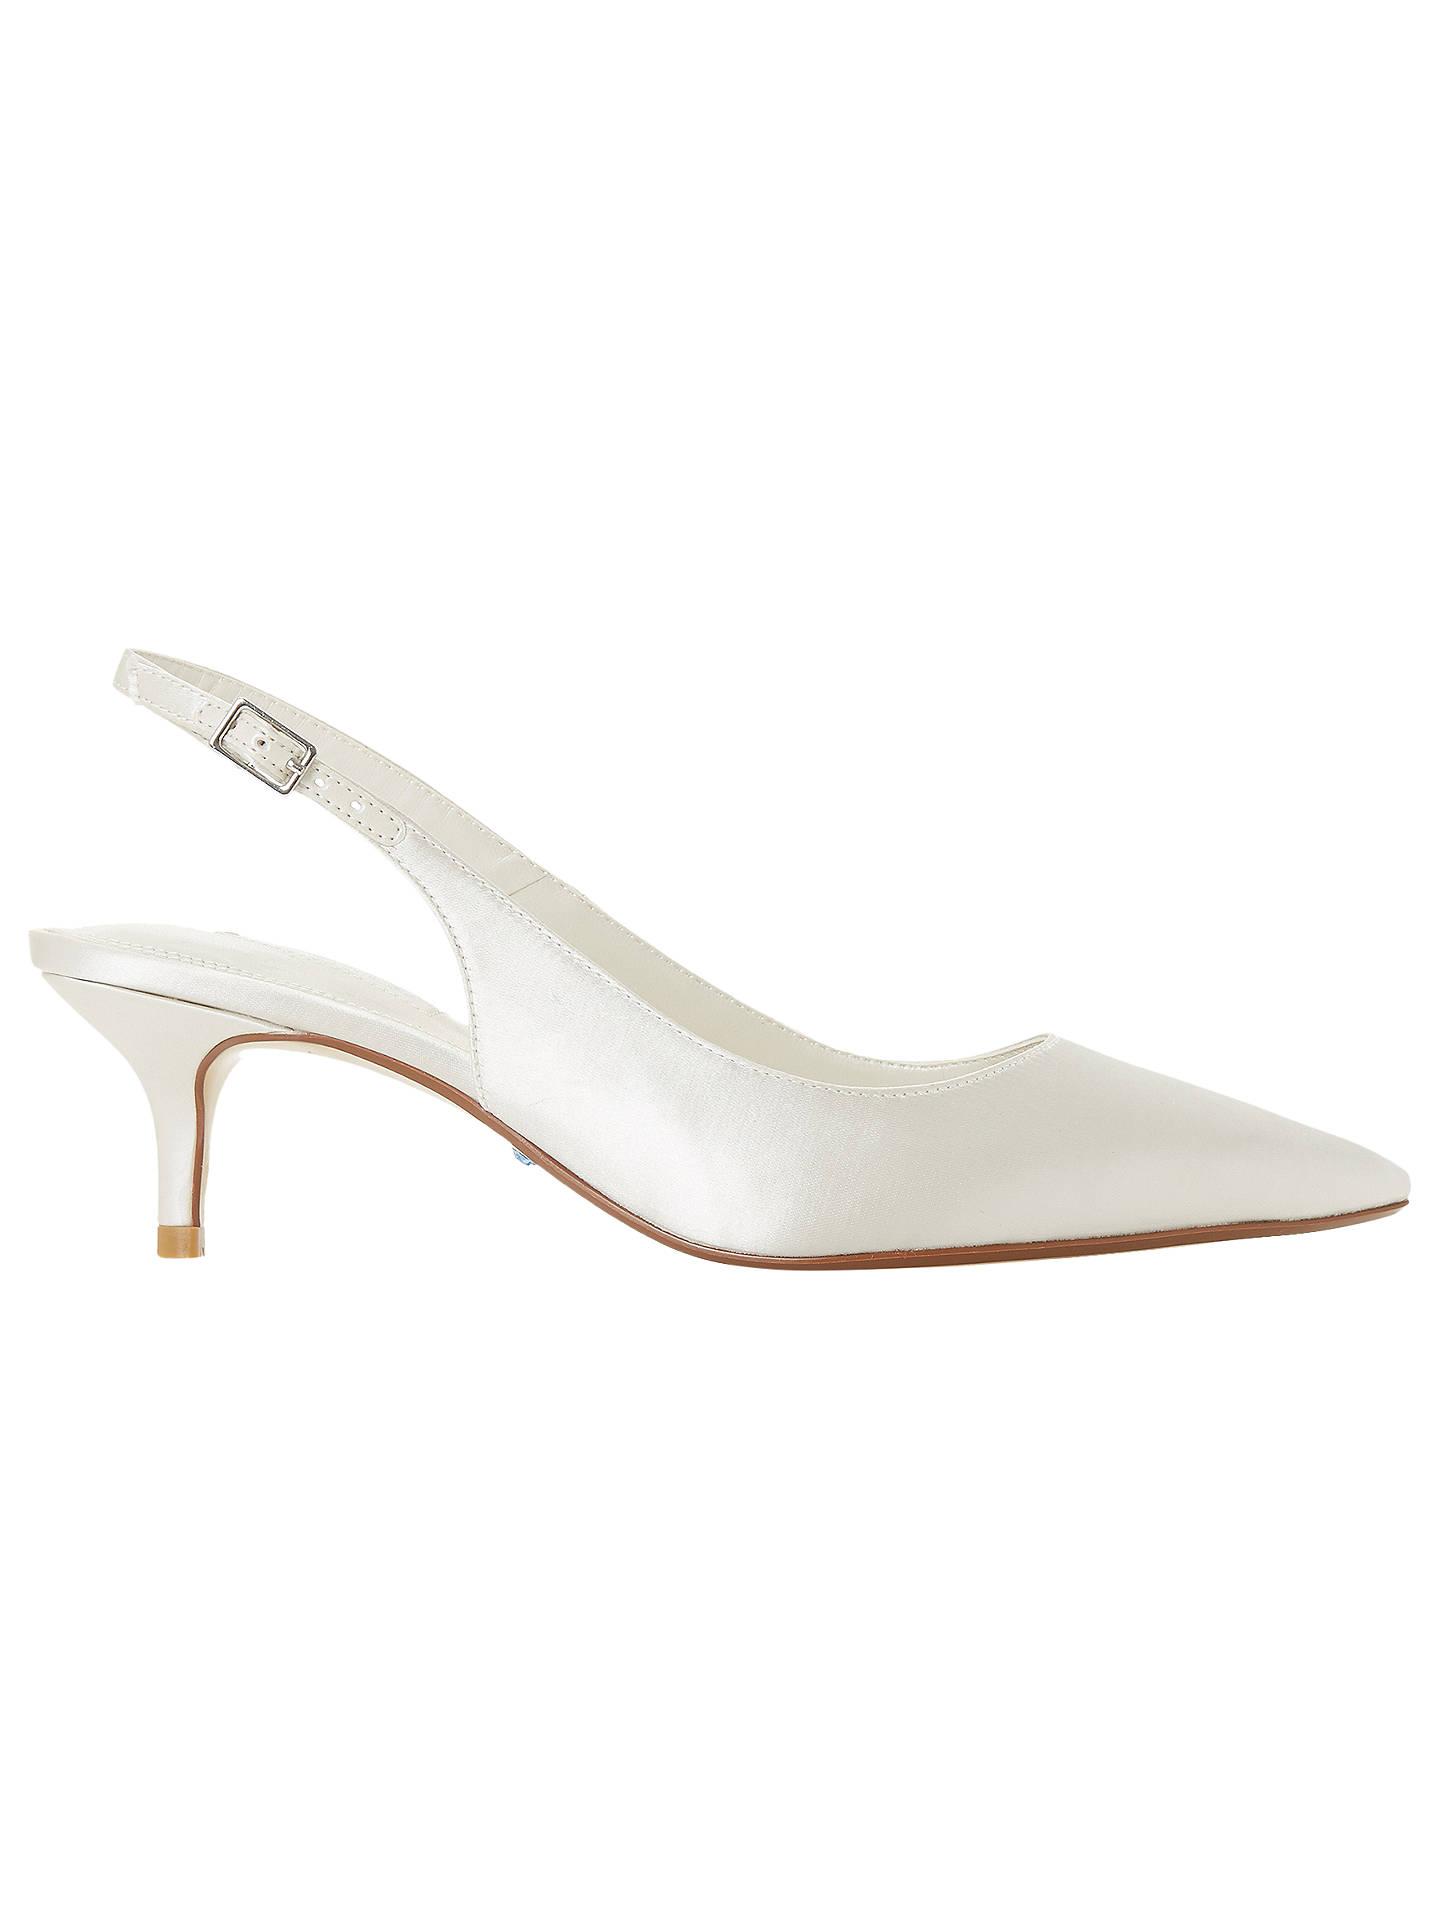 BuyDune Bridal Casandraa Kitten Heel Slingback Court Shoes de87ae29a76da